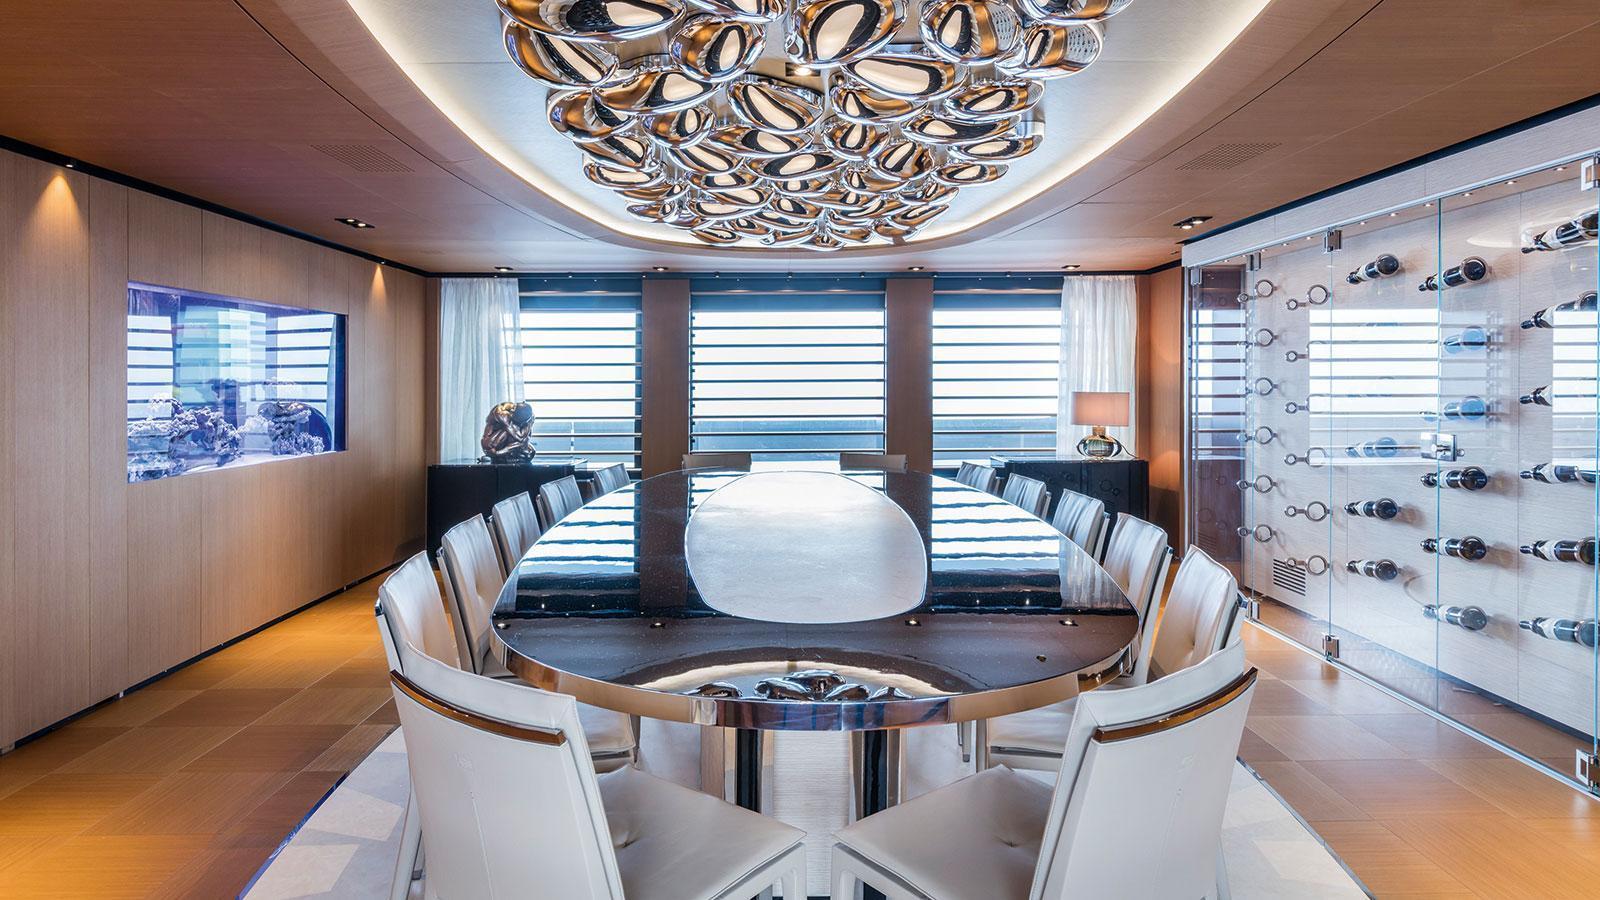 suerte-motor-yacht-tankoa-2015-69m-dining